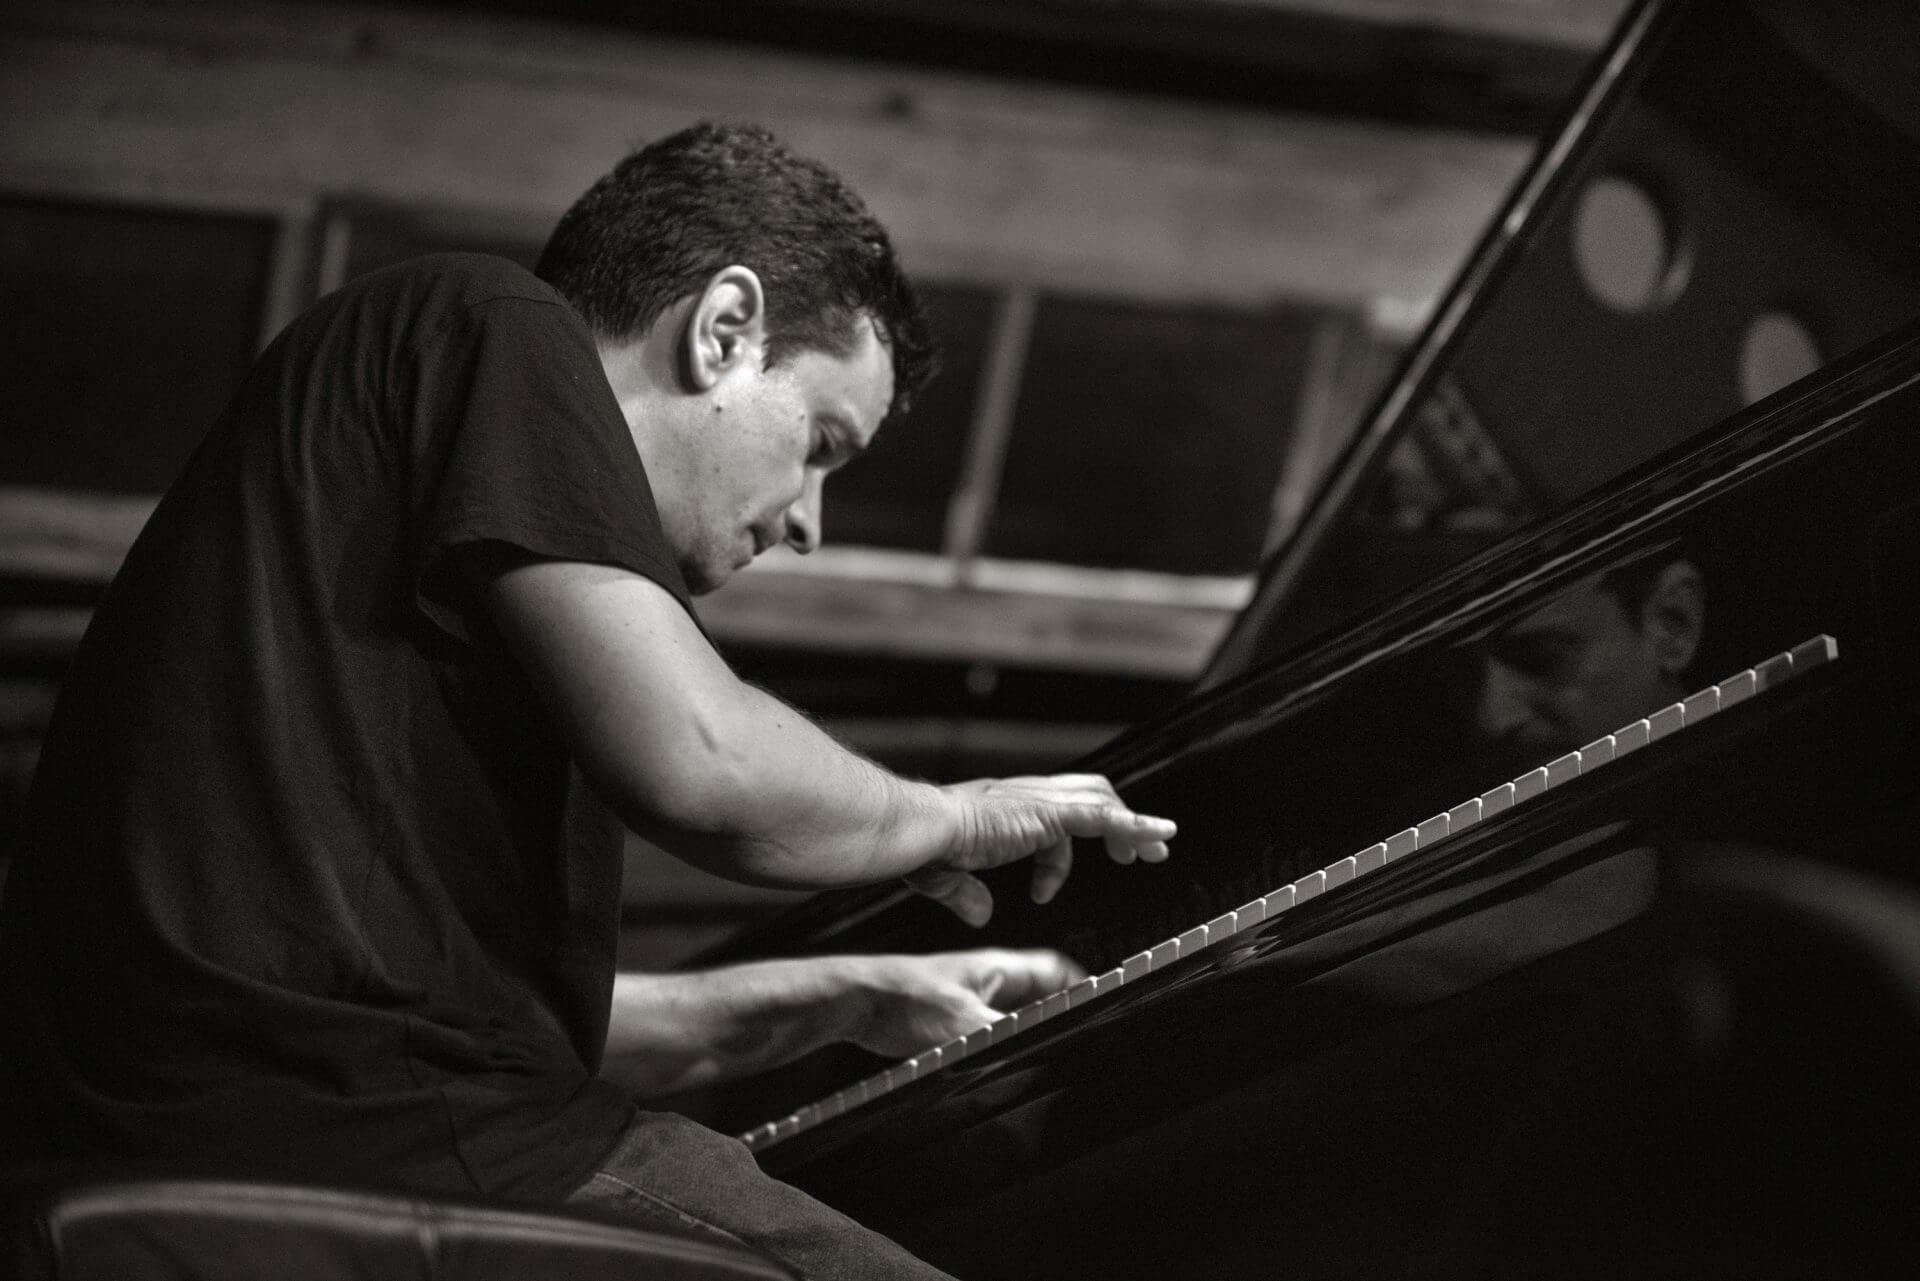 Rodrigo Pinheiro - fot.Nuno Martins